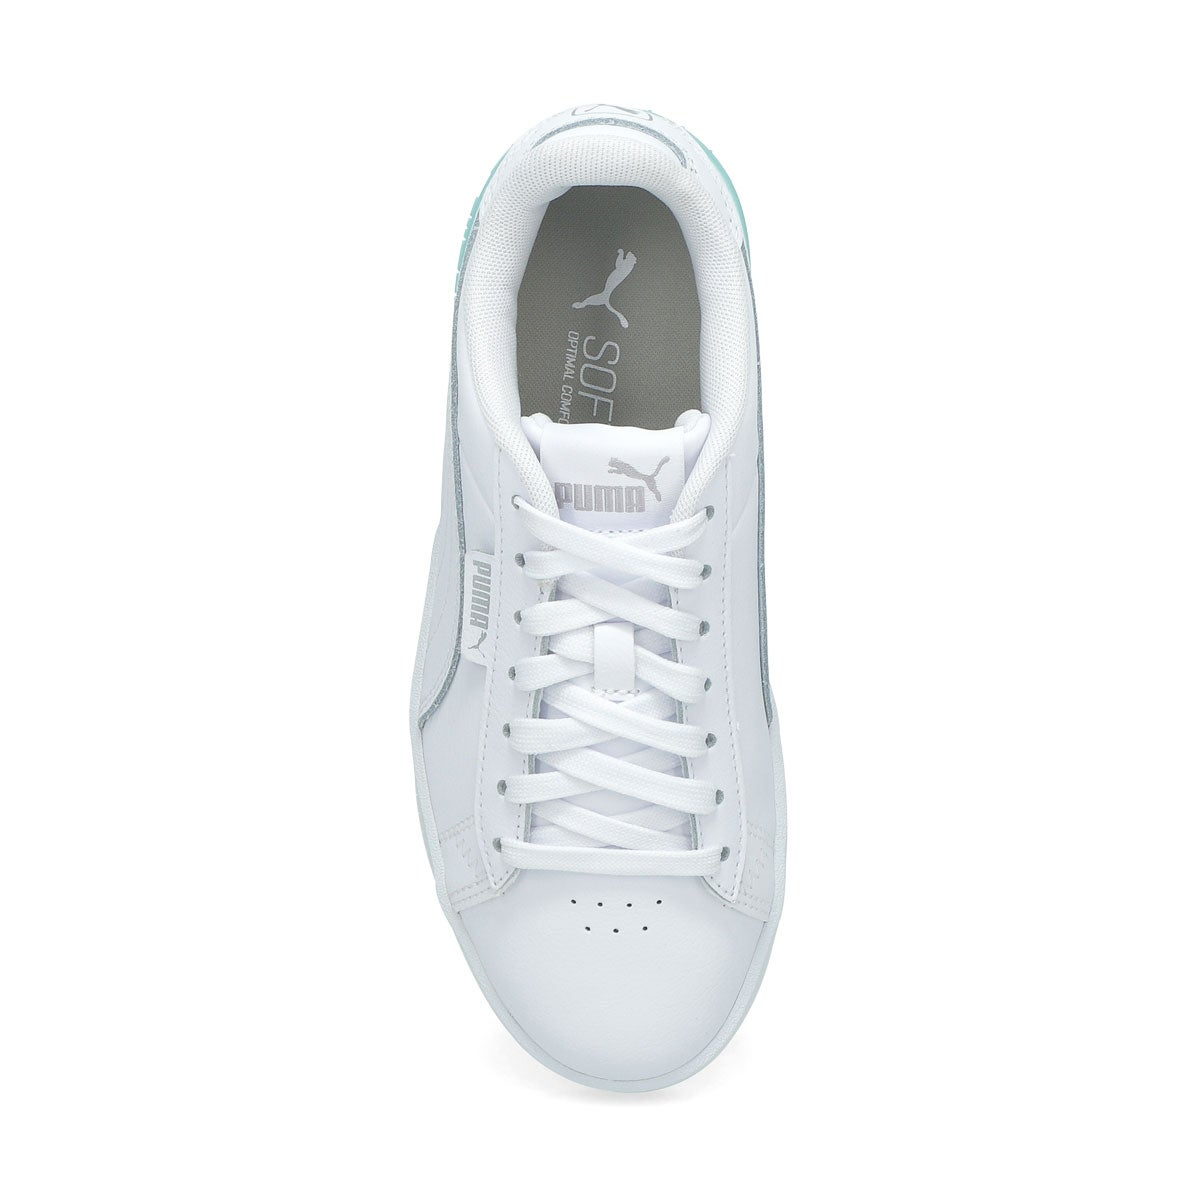 Girls' Puma Jada Jr Sneaker-White/Silver/Blue